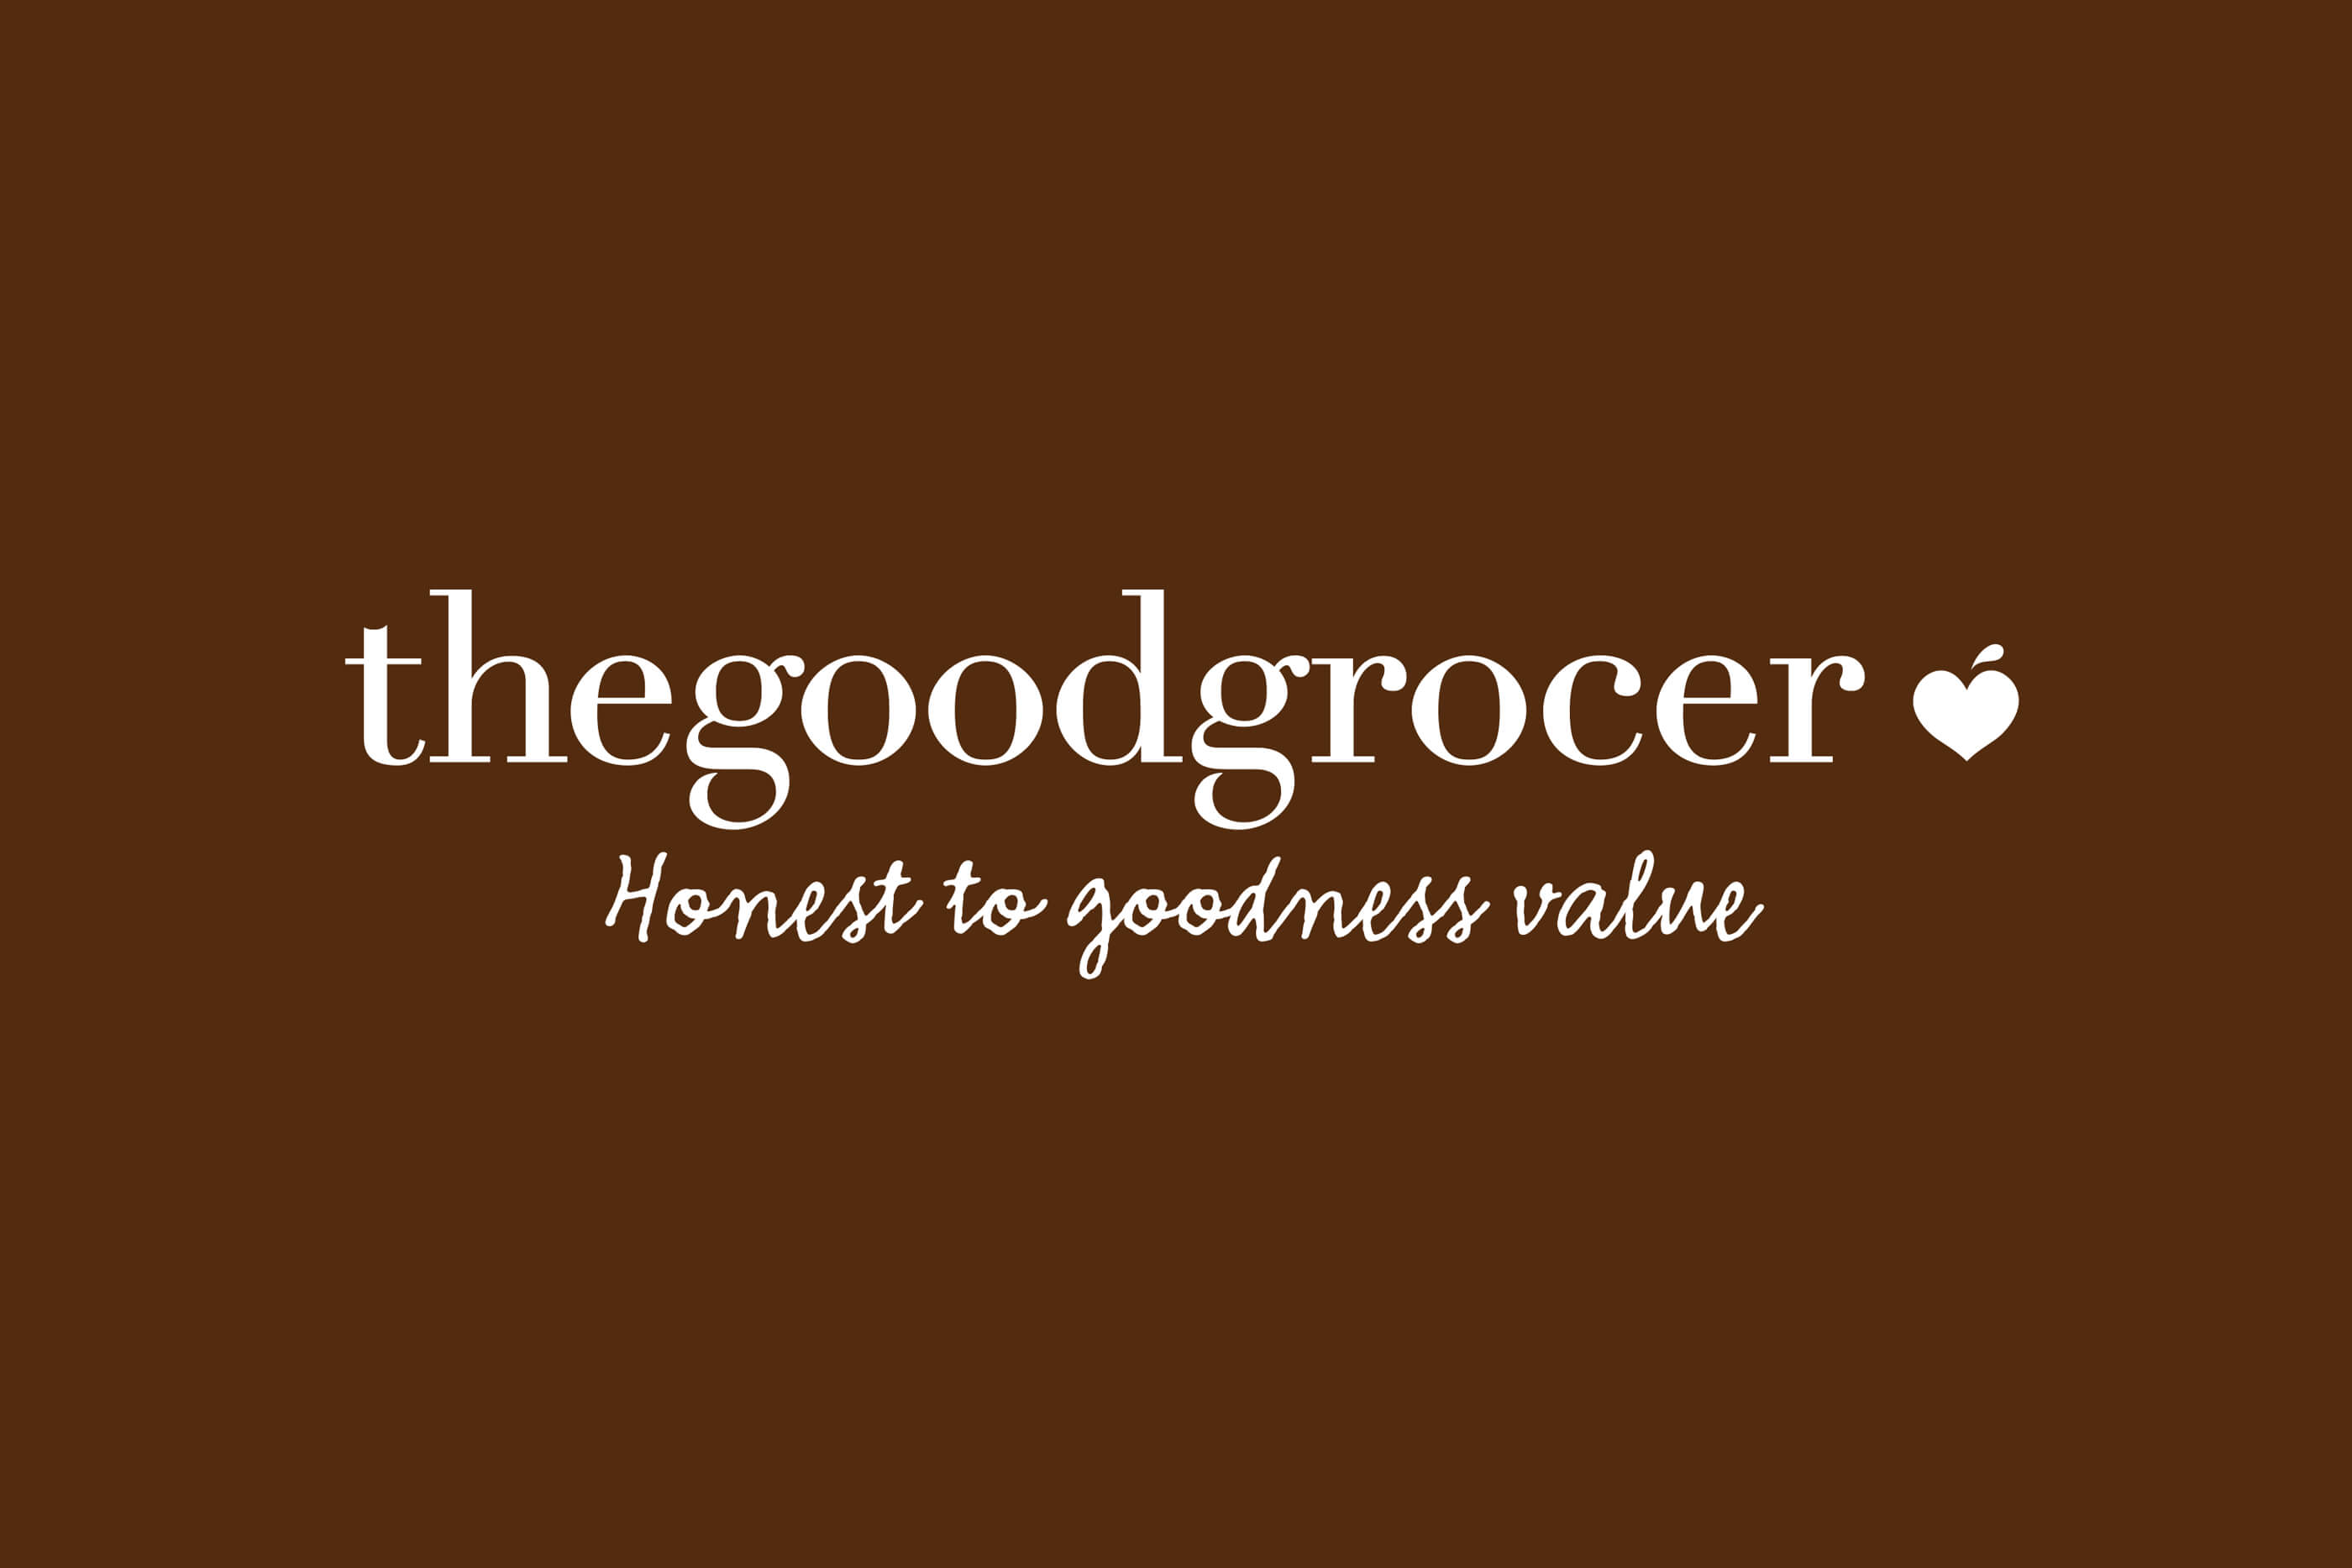 thegoodgrocer-brandmark